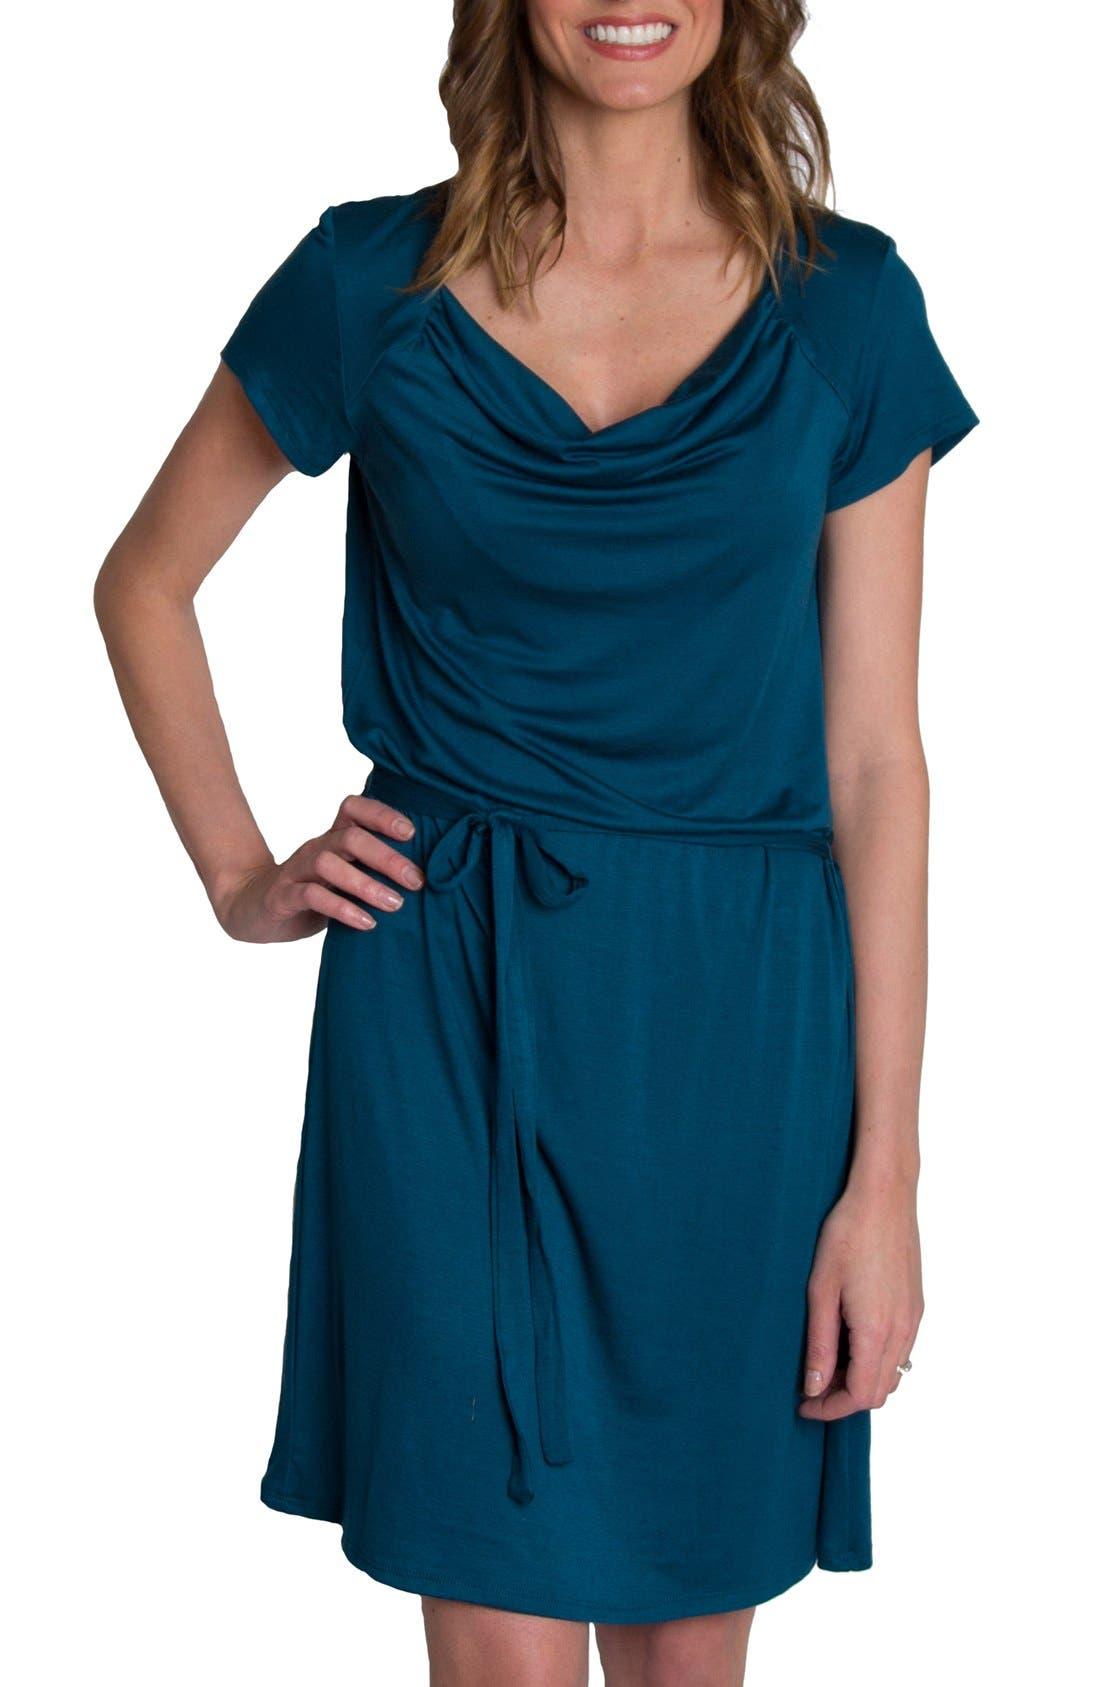 UDDERLY HOT MAMA Chic Cowl Neck Nursing Dress